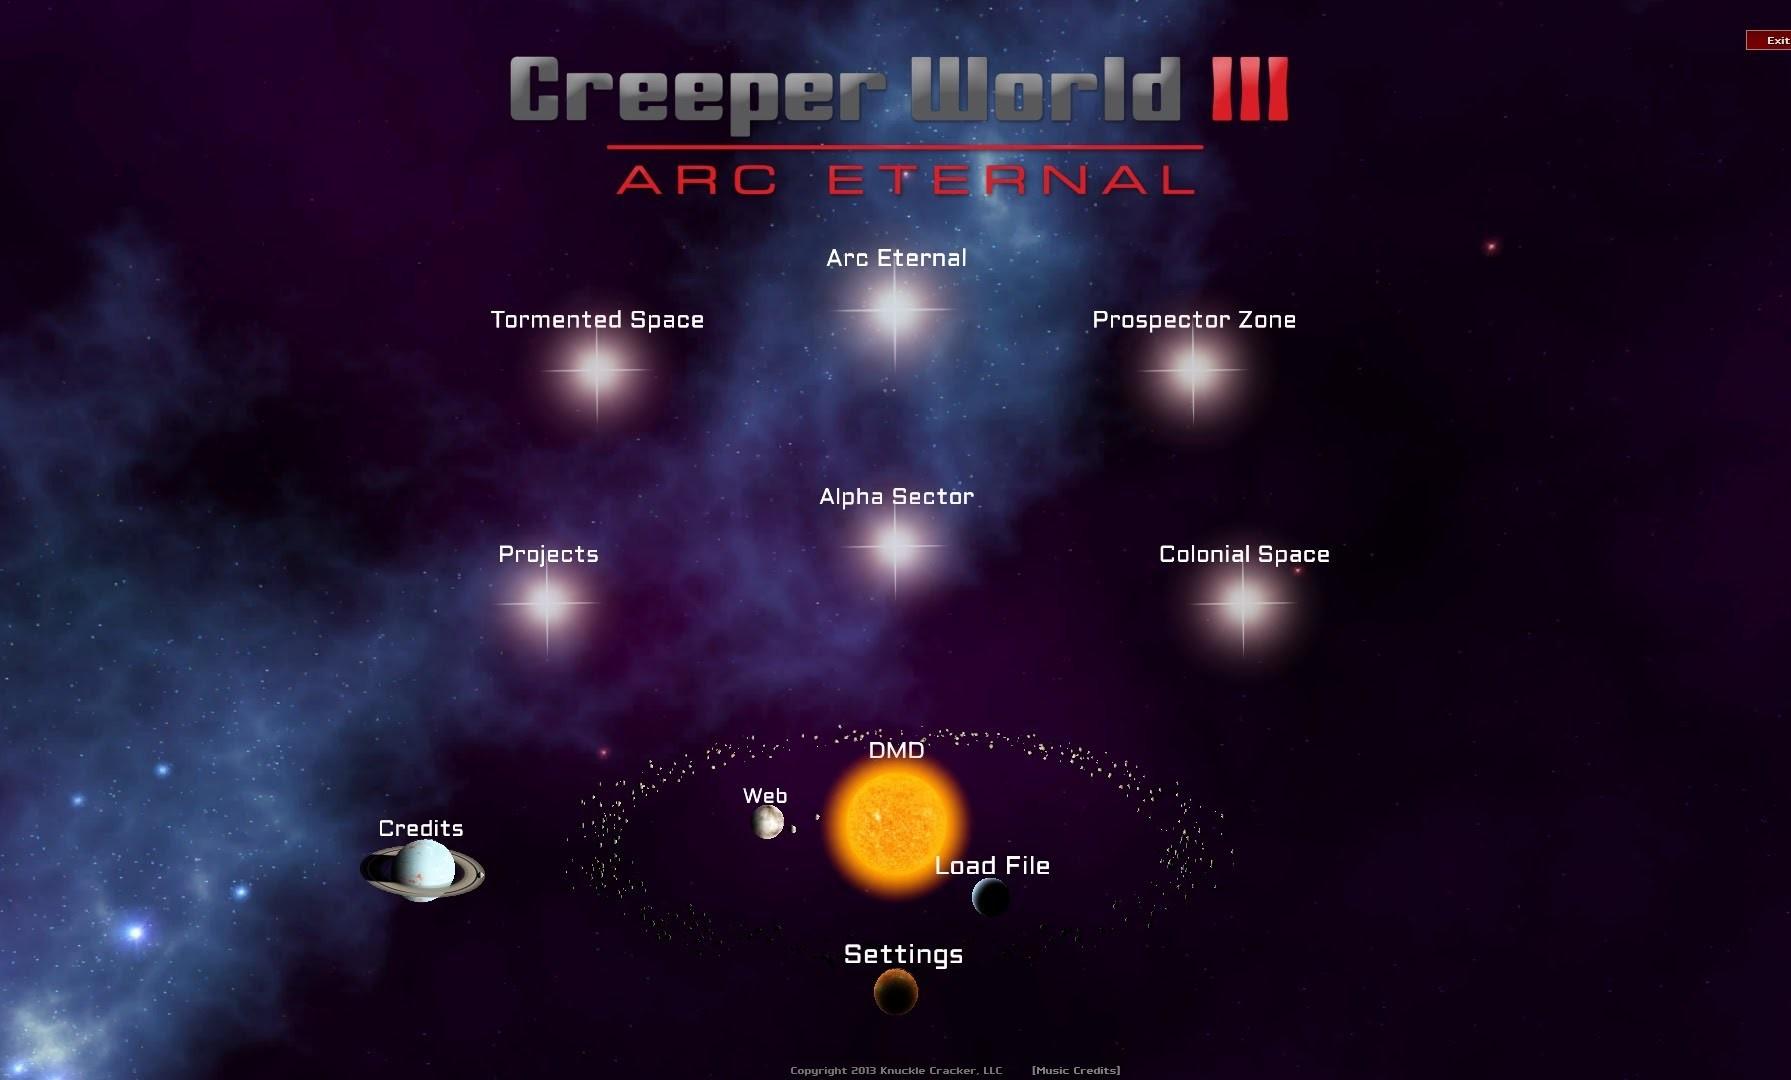 CREEPER WORLD 3